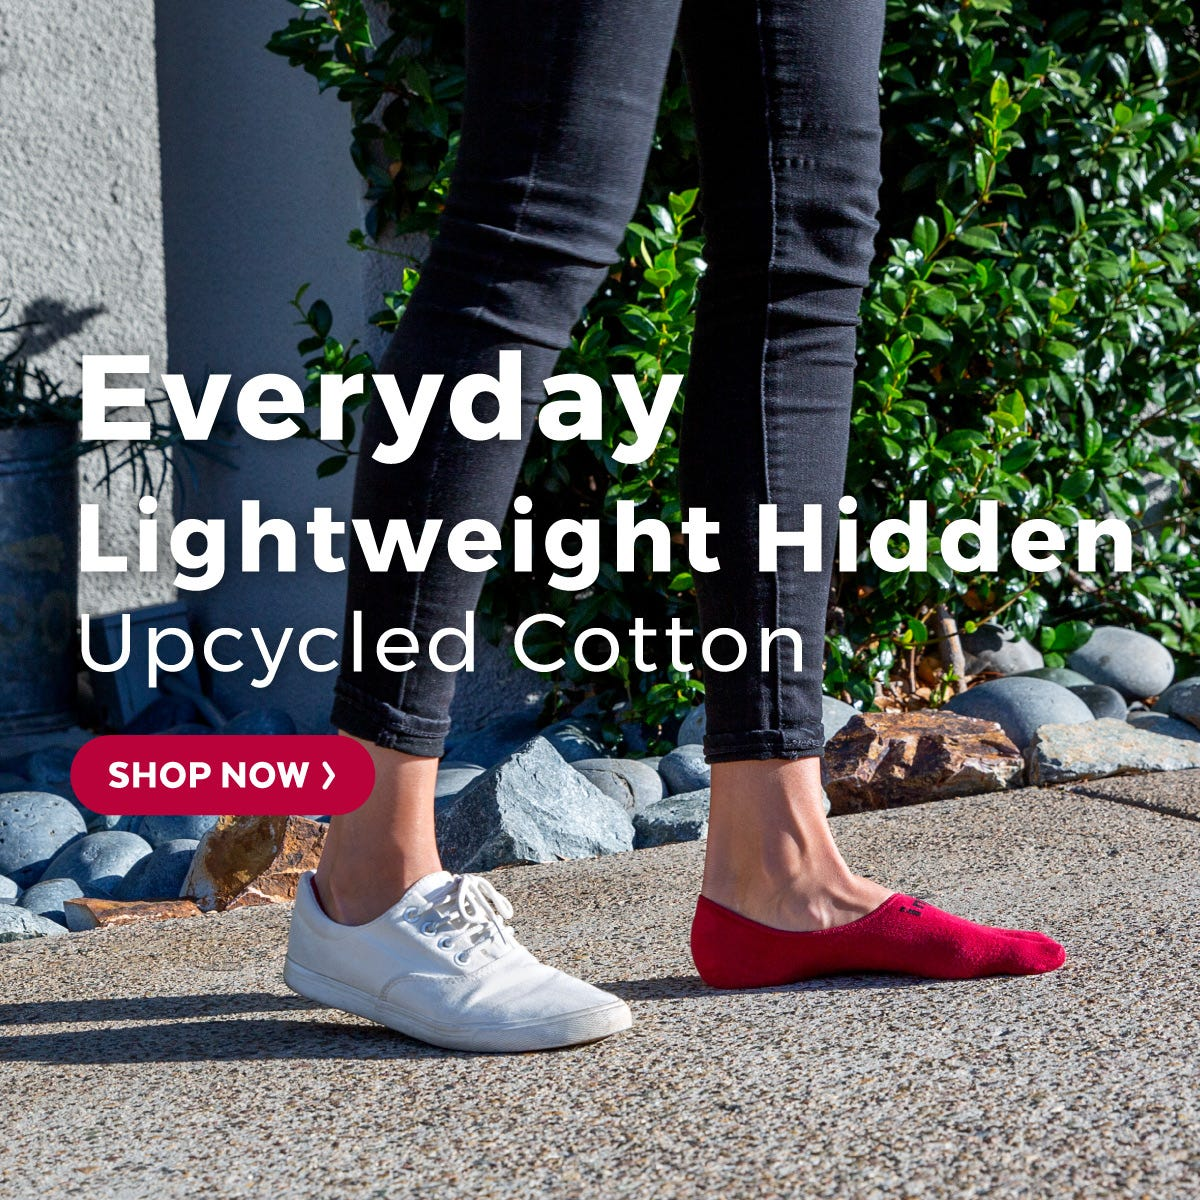 Everyday Lightweight Hidden Upcycled Cotton